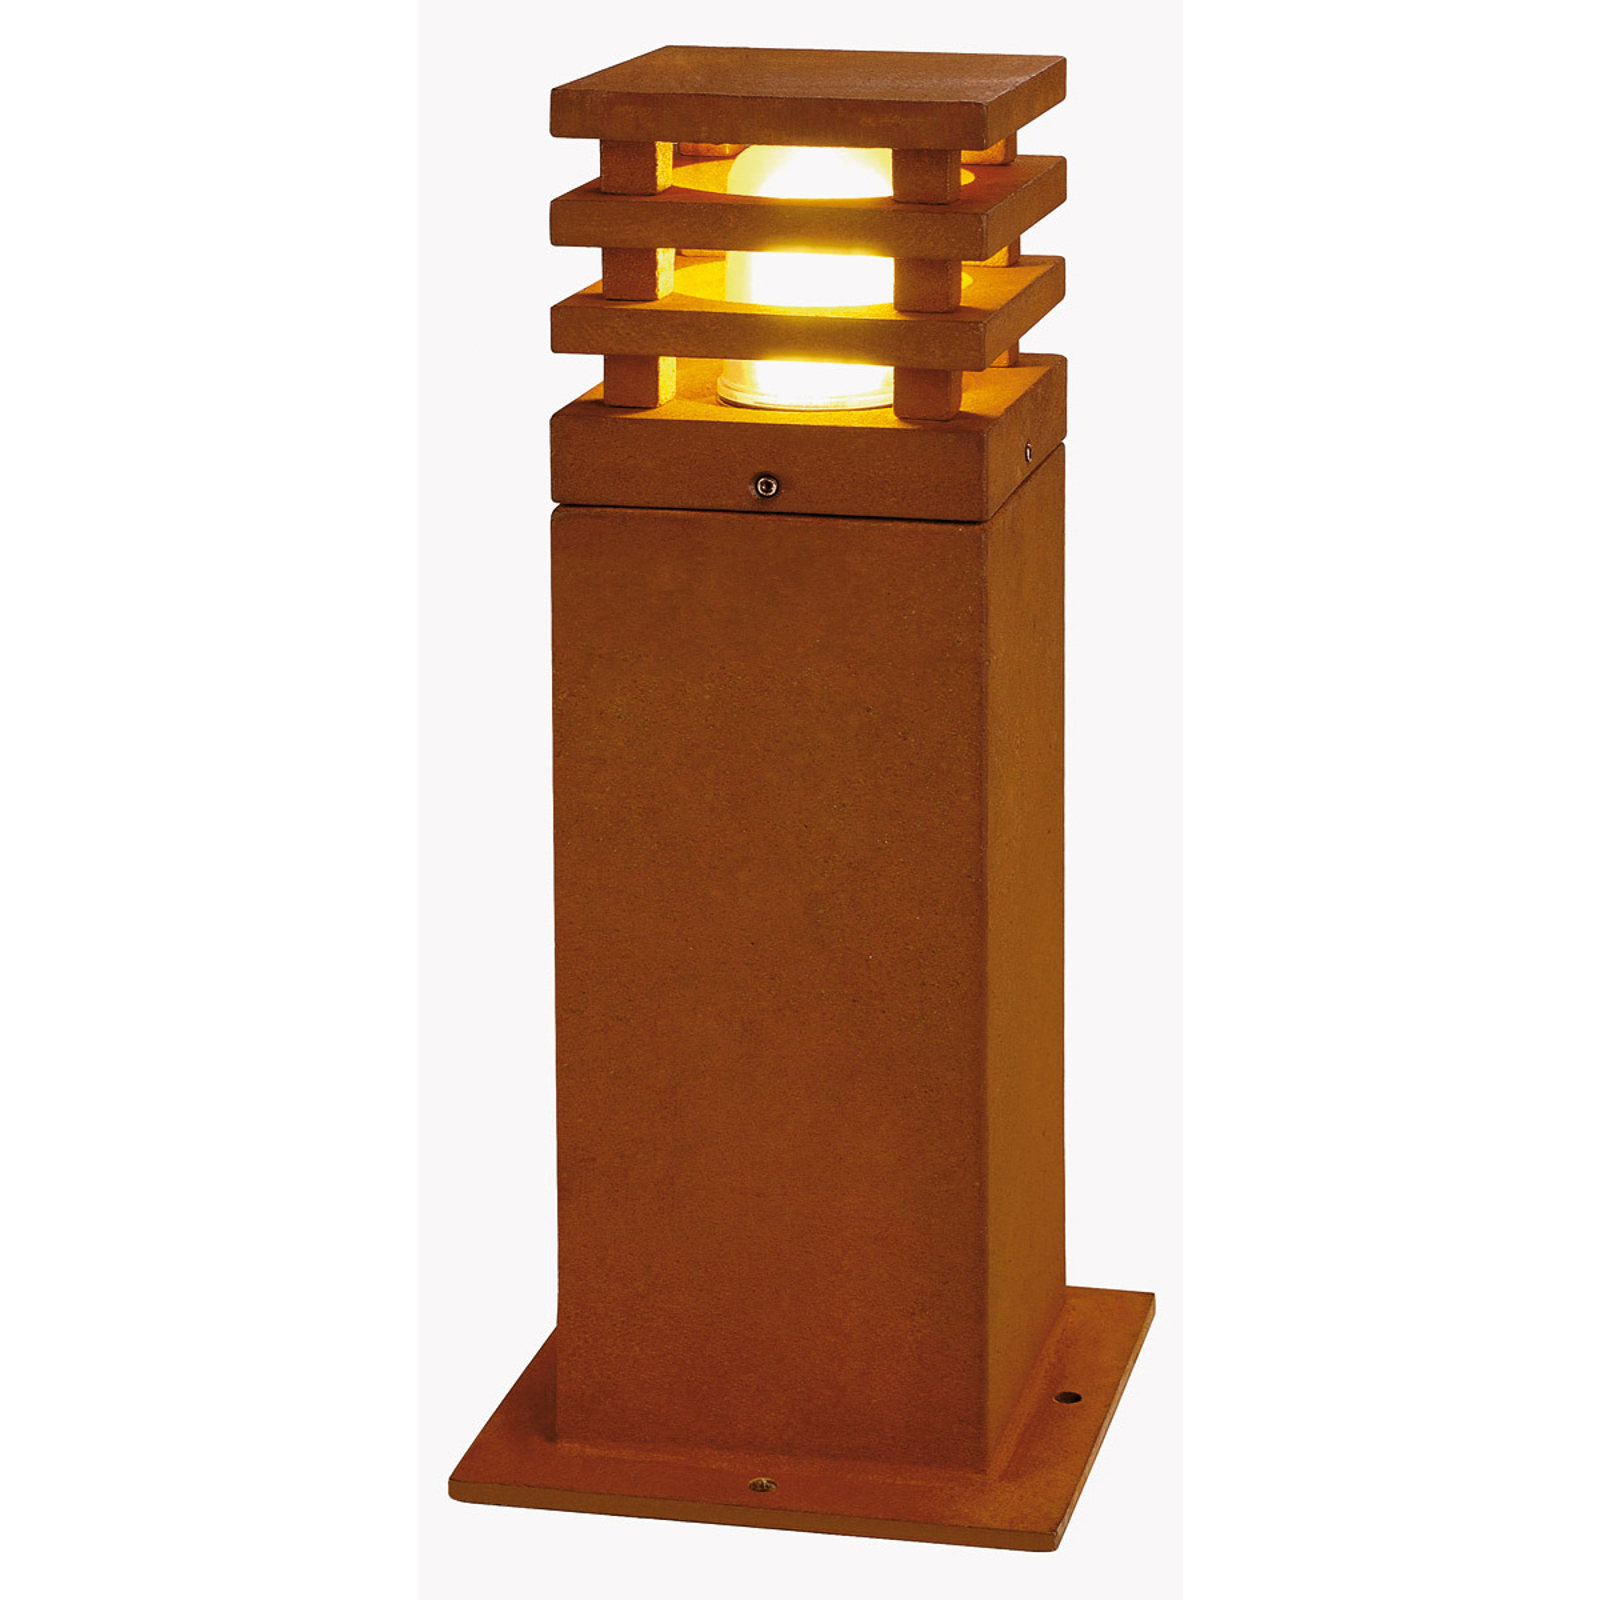 Rusty Square LED pillar light, 40 cm high_5504662_1